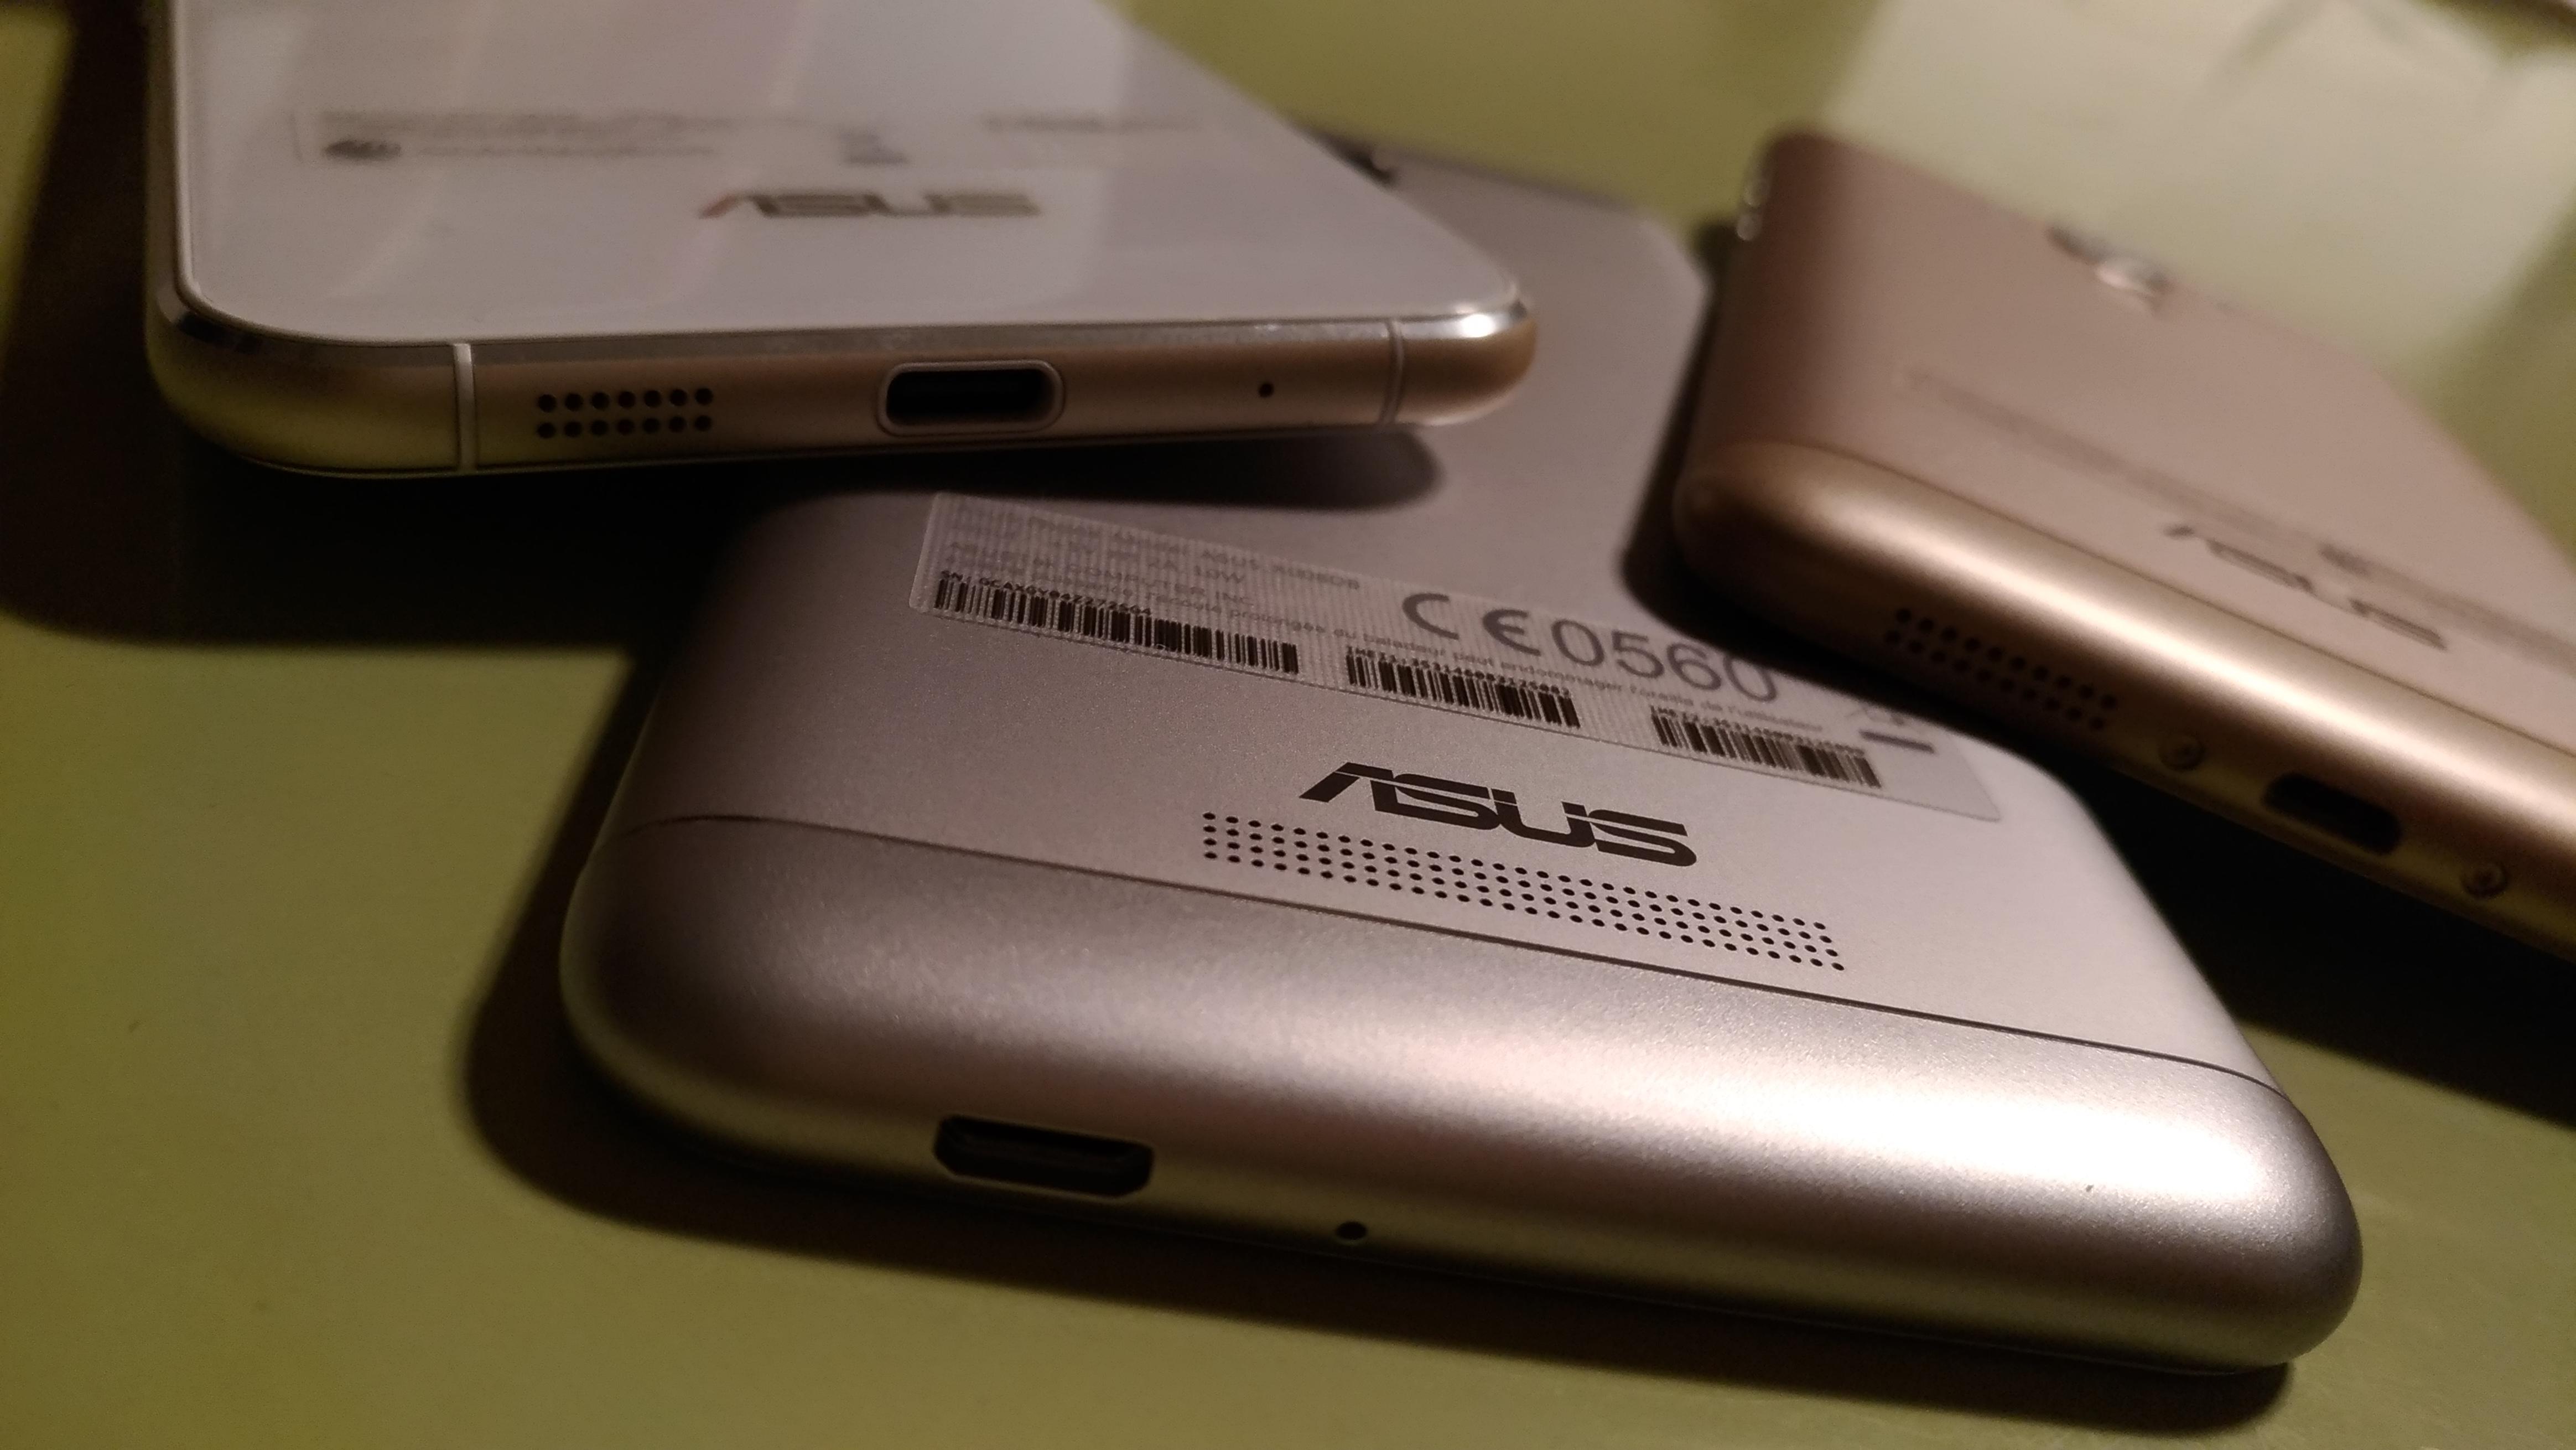 Zenfone 3 シリーズはどれも角が丸くて可愛らしいし